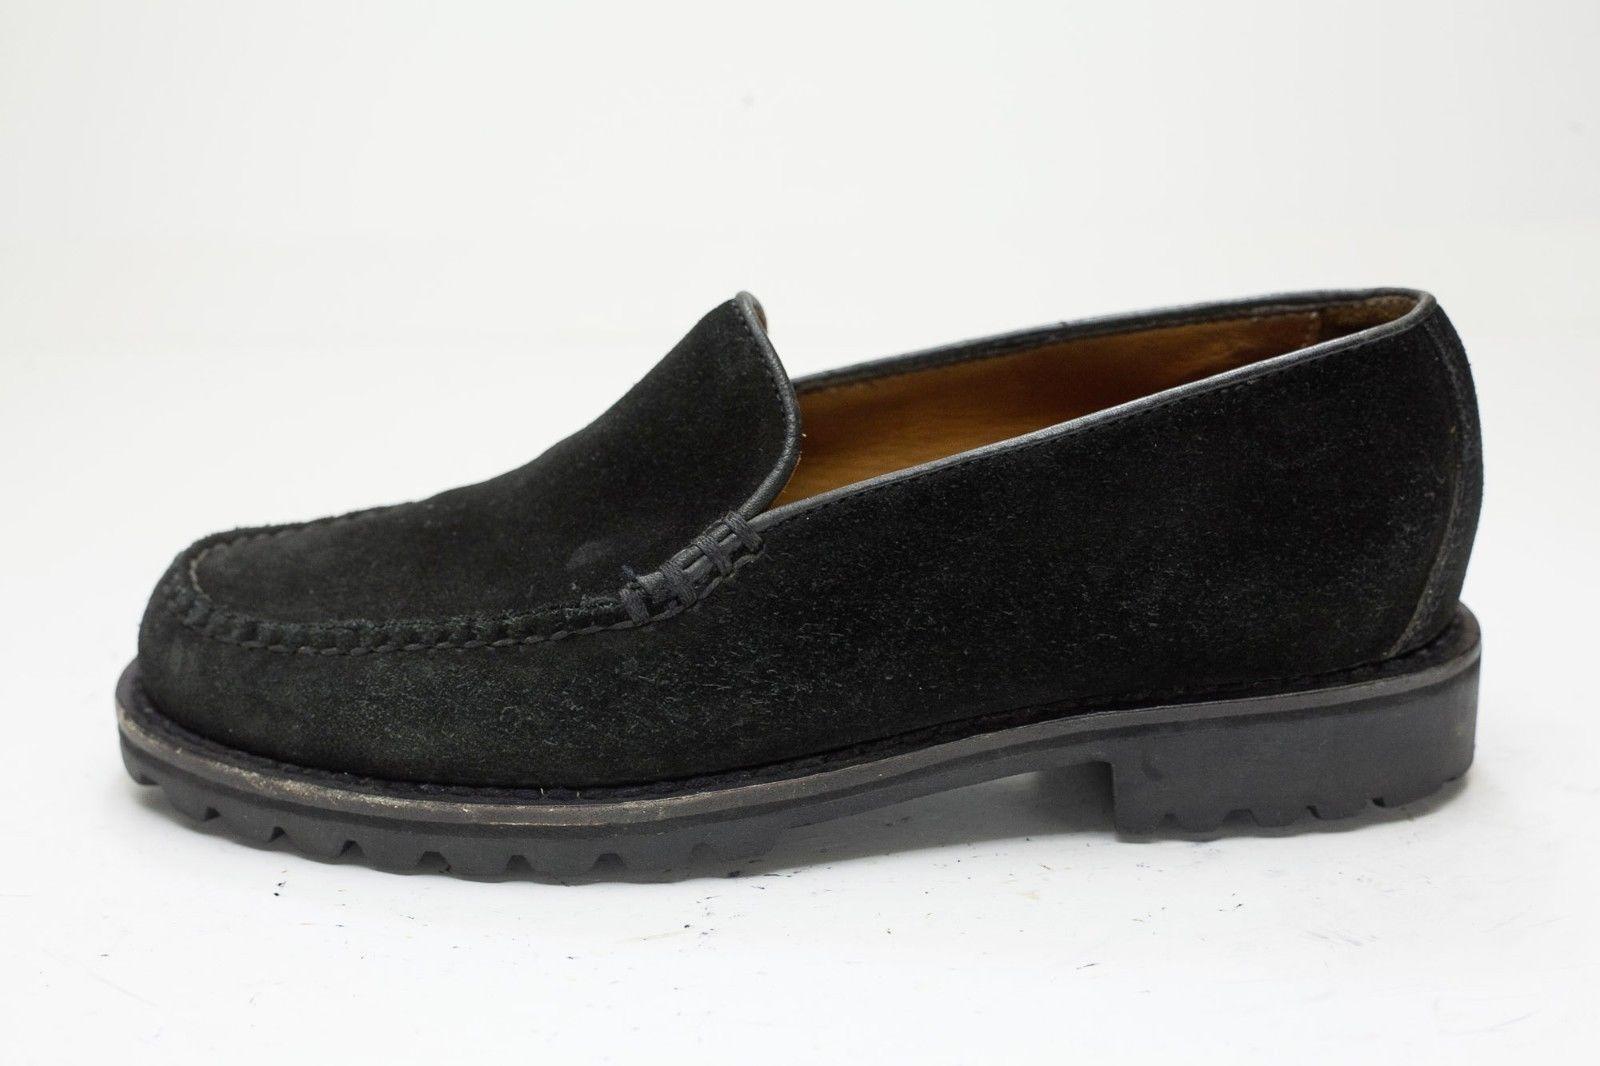 Cole Haan 6 Black Suede Slip On Loafer Women's image 2